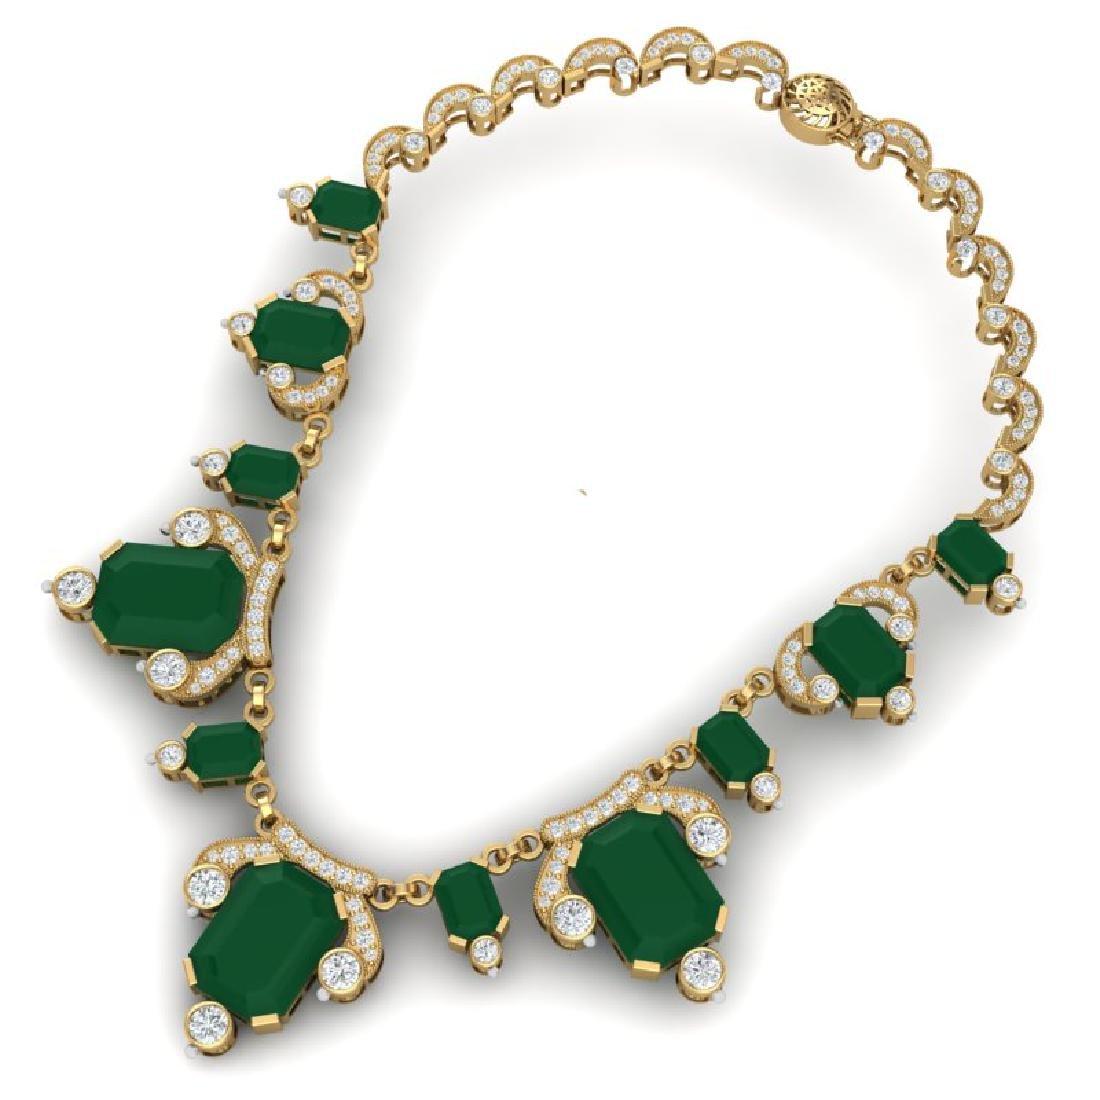 75.21 CTW Royalty Emerald & VS Diamond Necklace 18K - 3